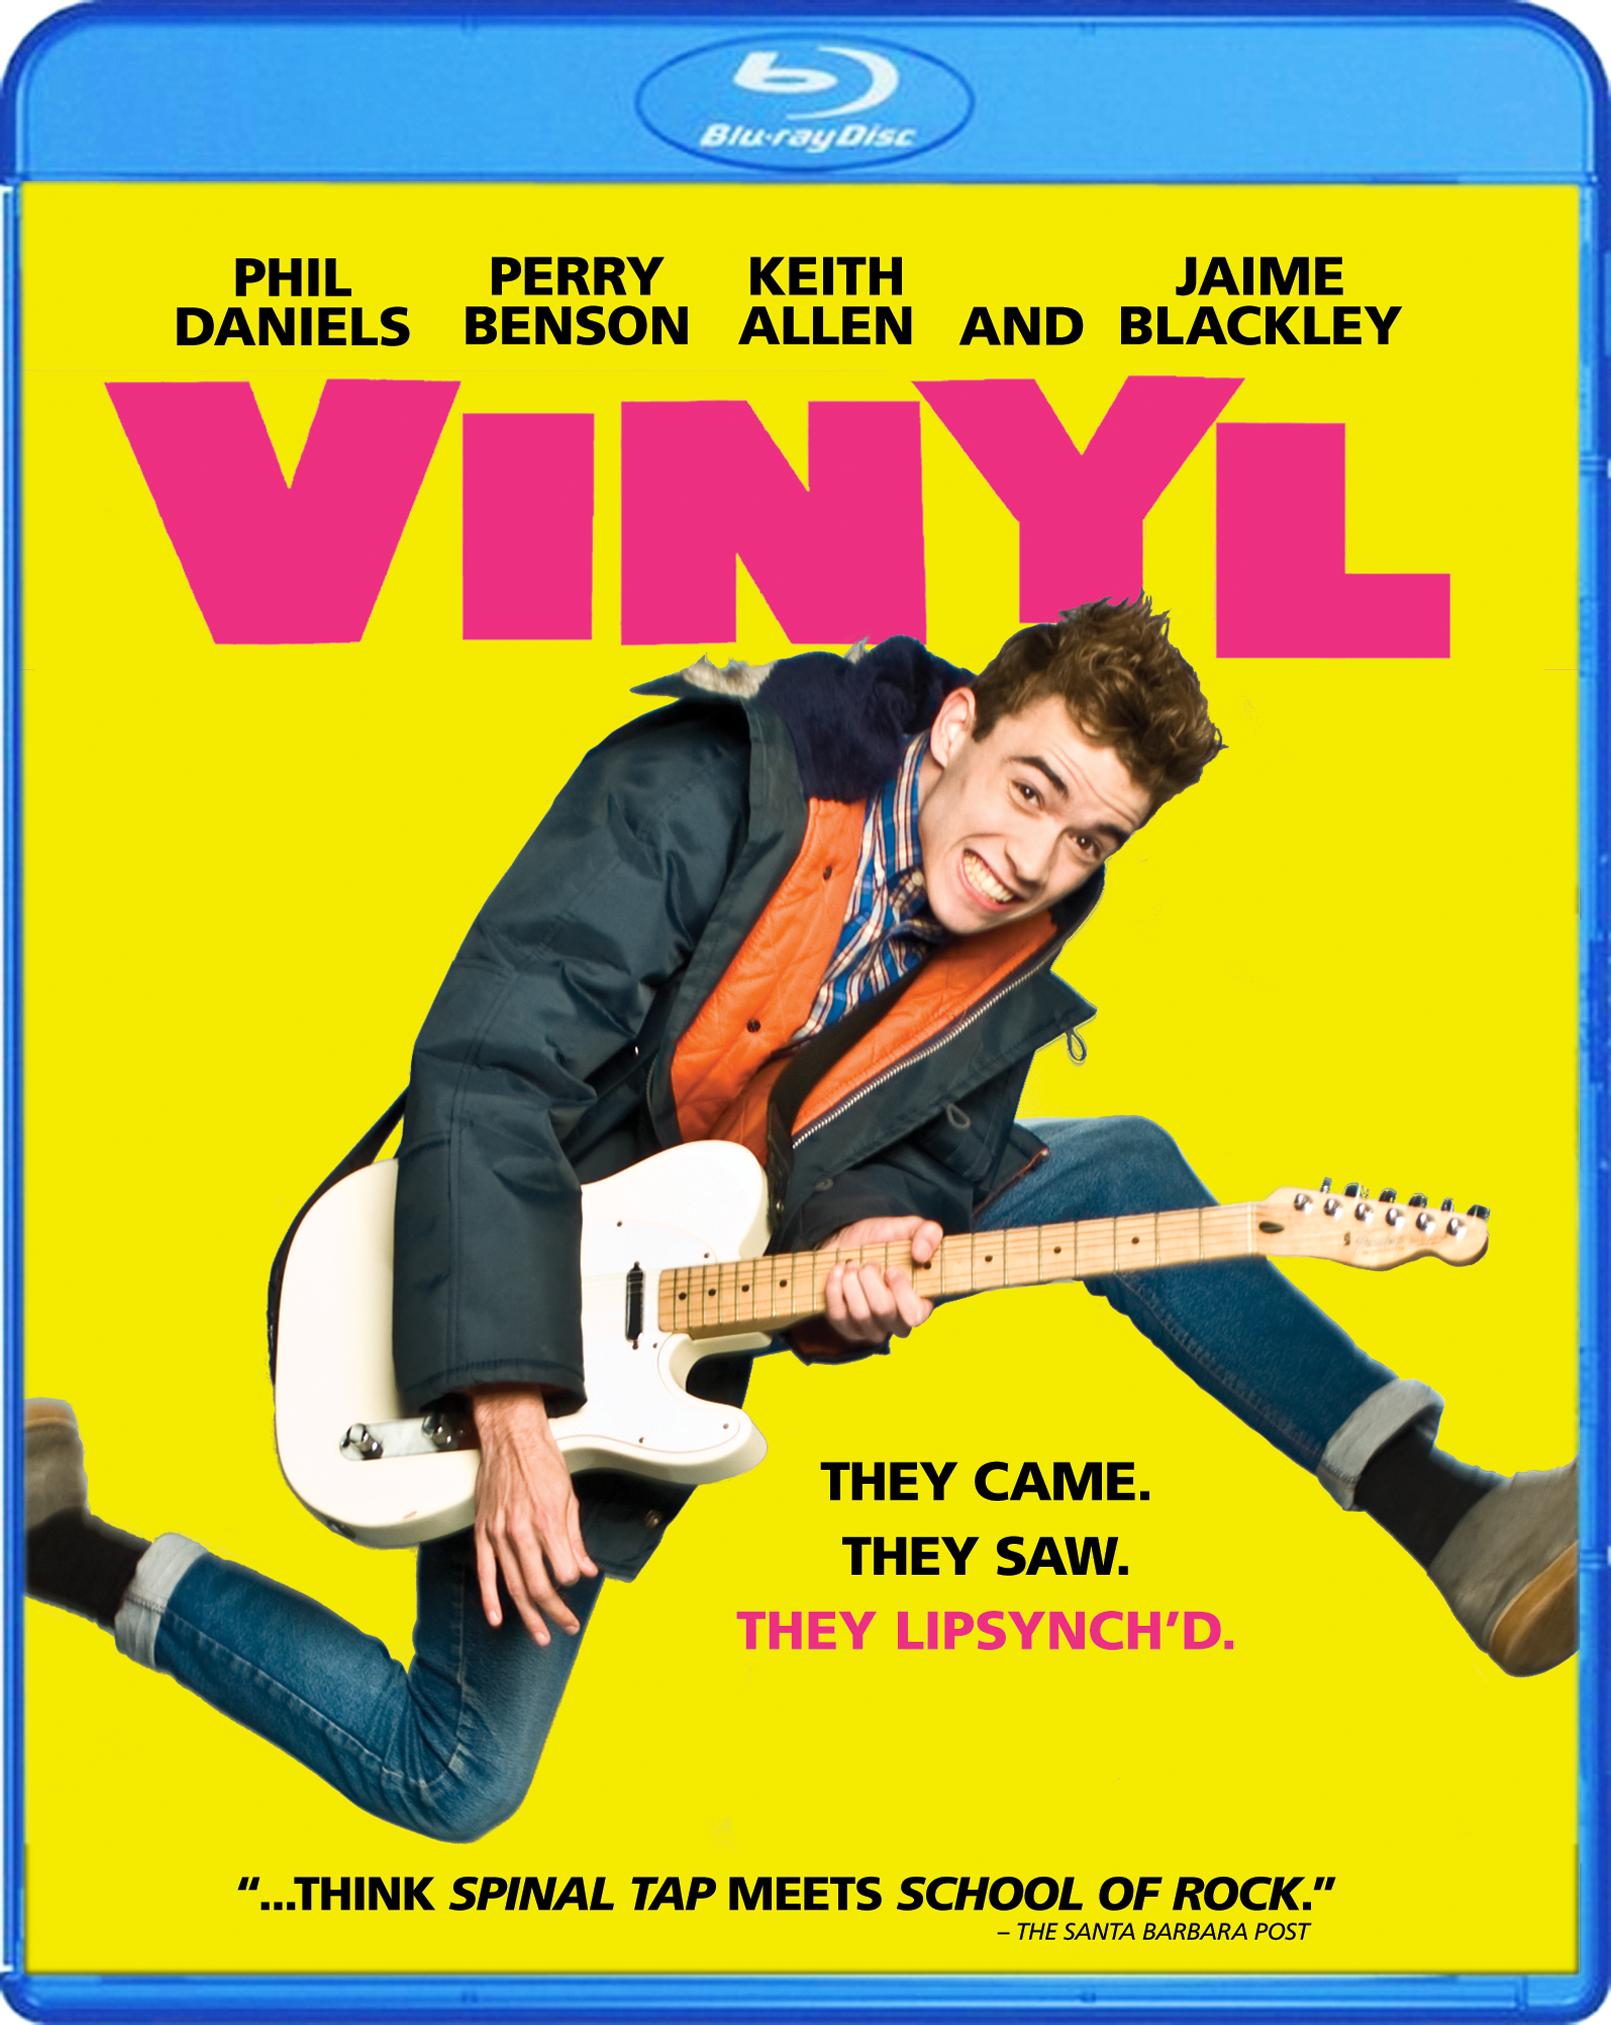 VinylBRCover300dpi.png